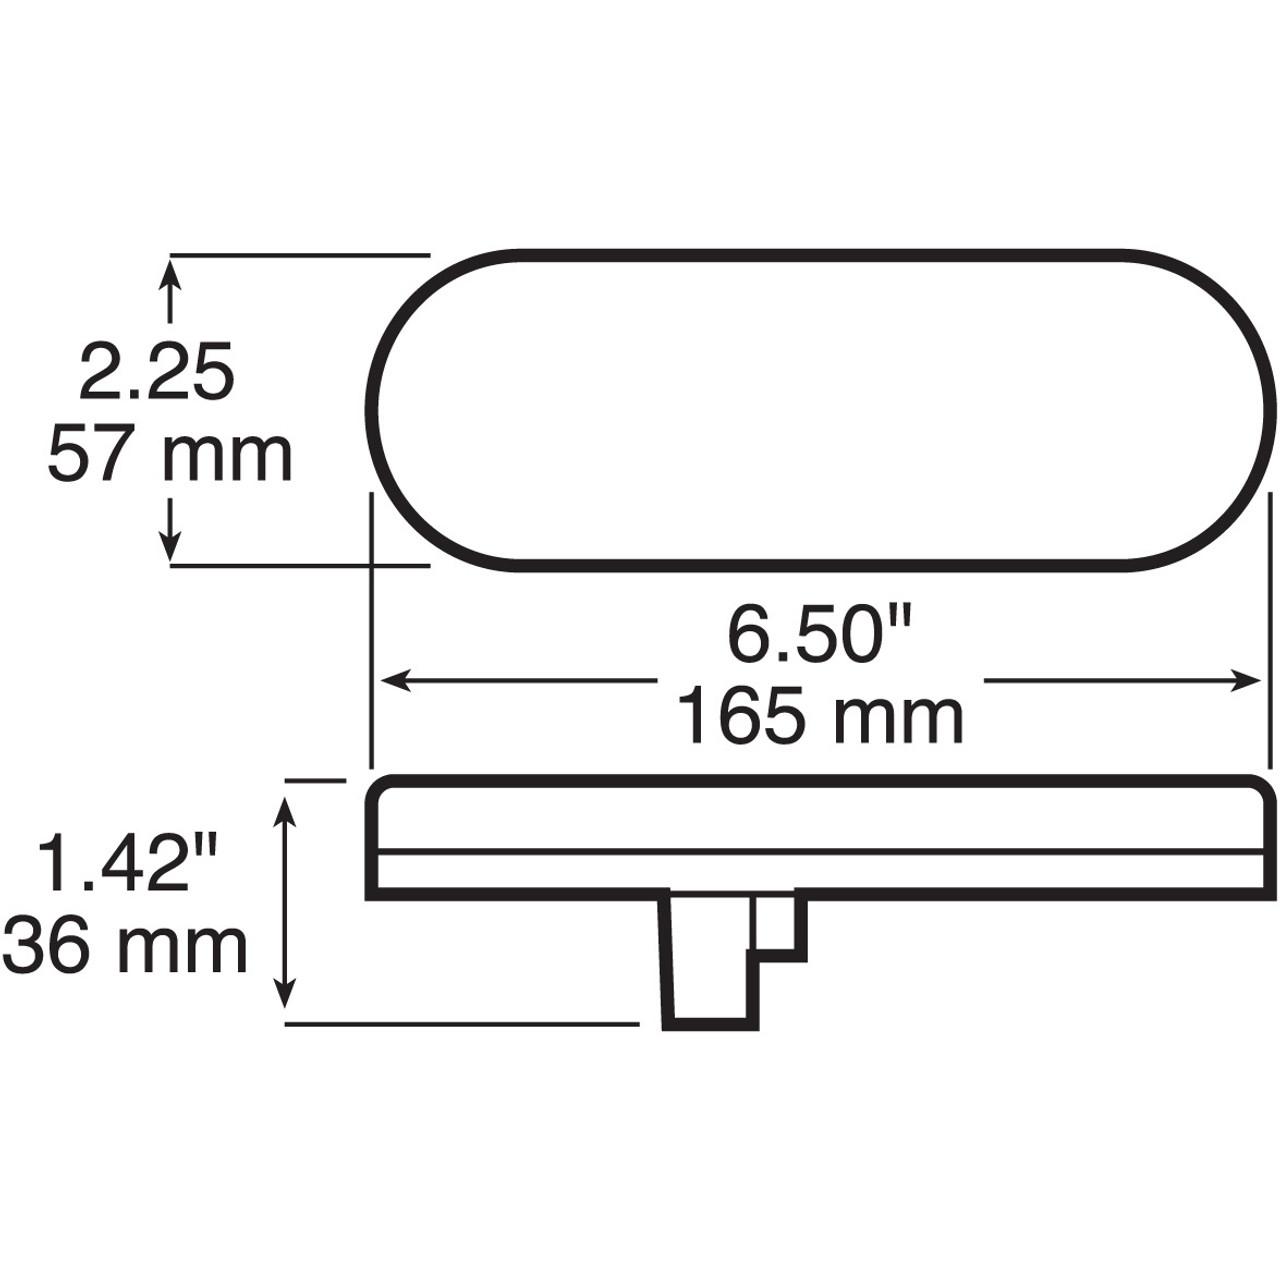 LED421KR7 --- Oval Sealed LED Tail Light Kit- 7 Diodes